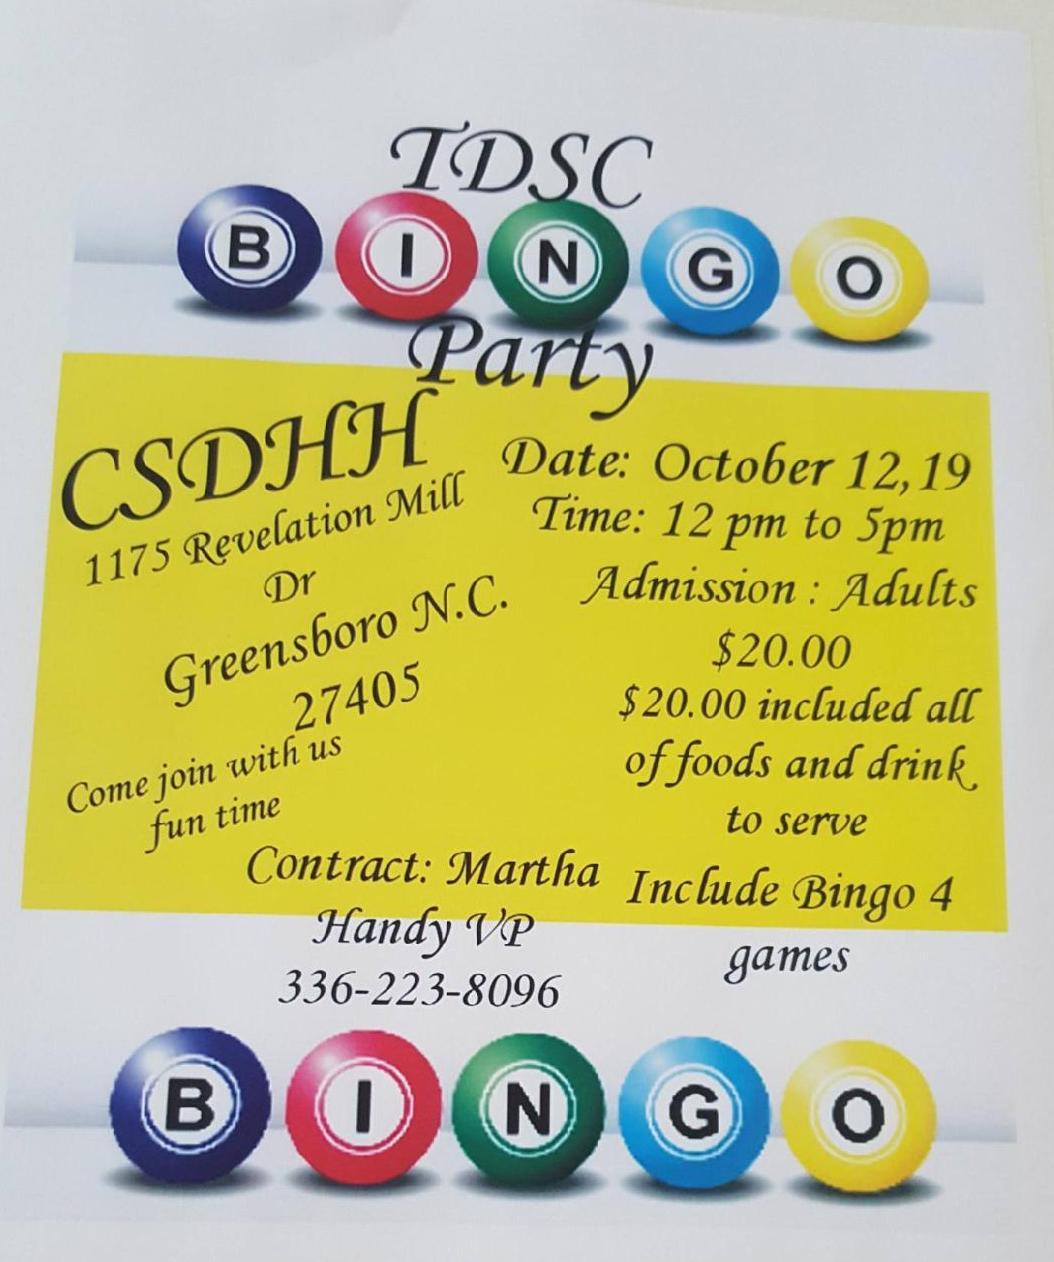 TDSC_Oct19.jpeg